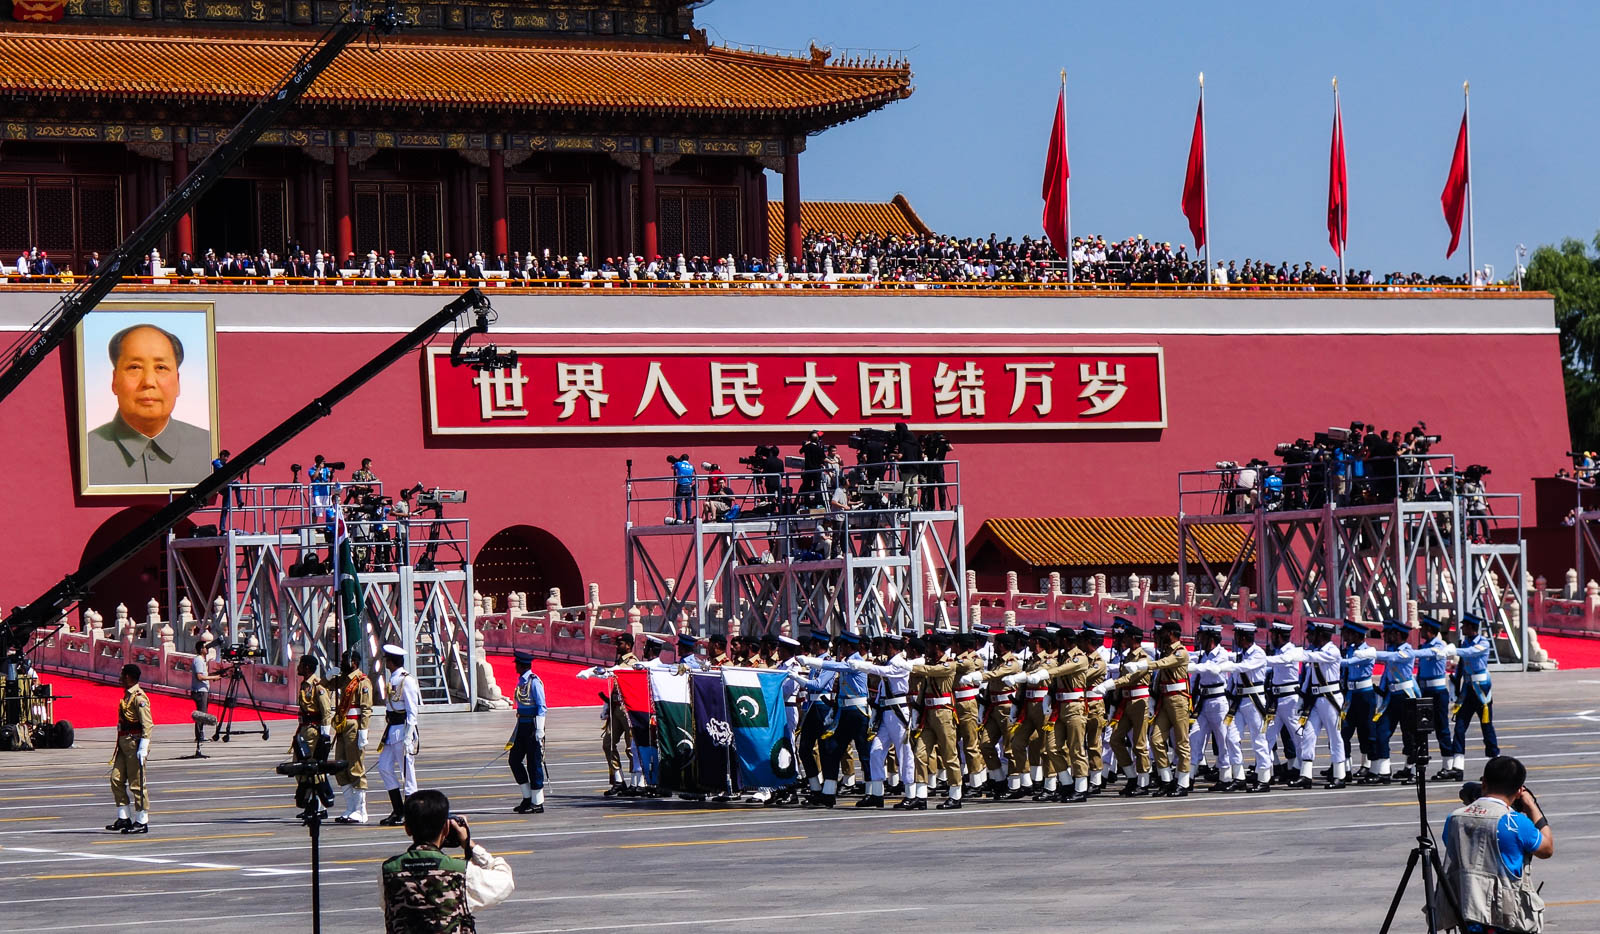 beijing-china-military-parade-2015-24